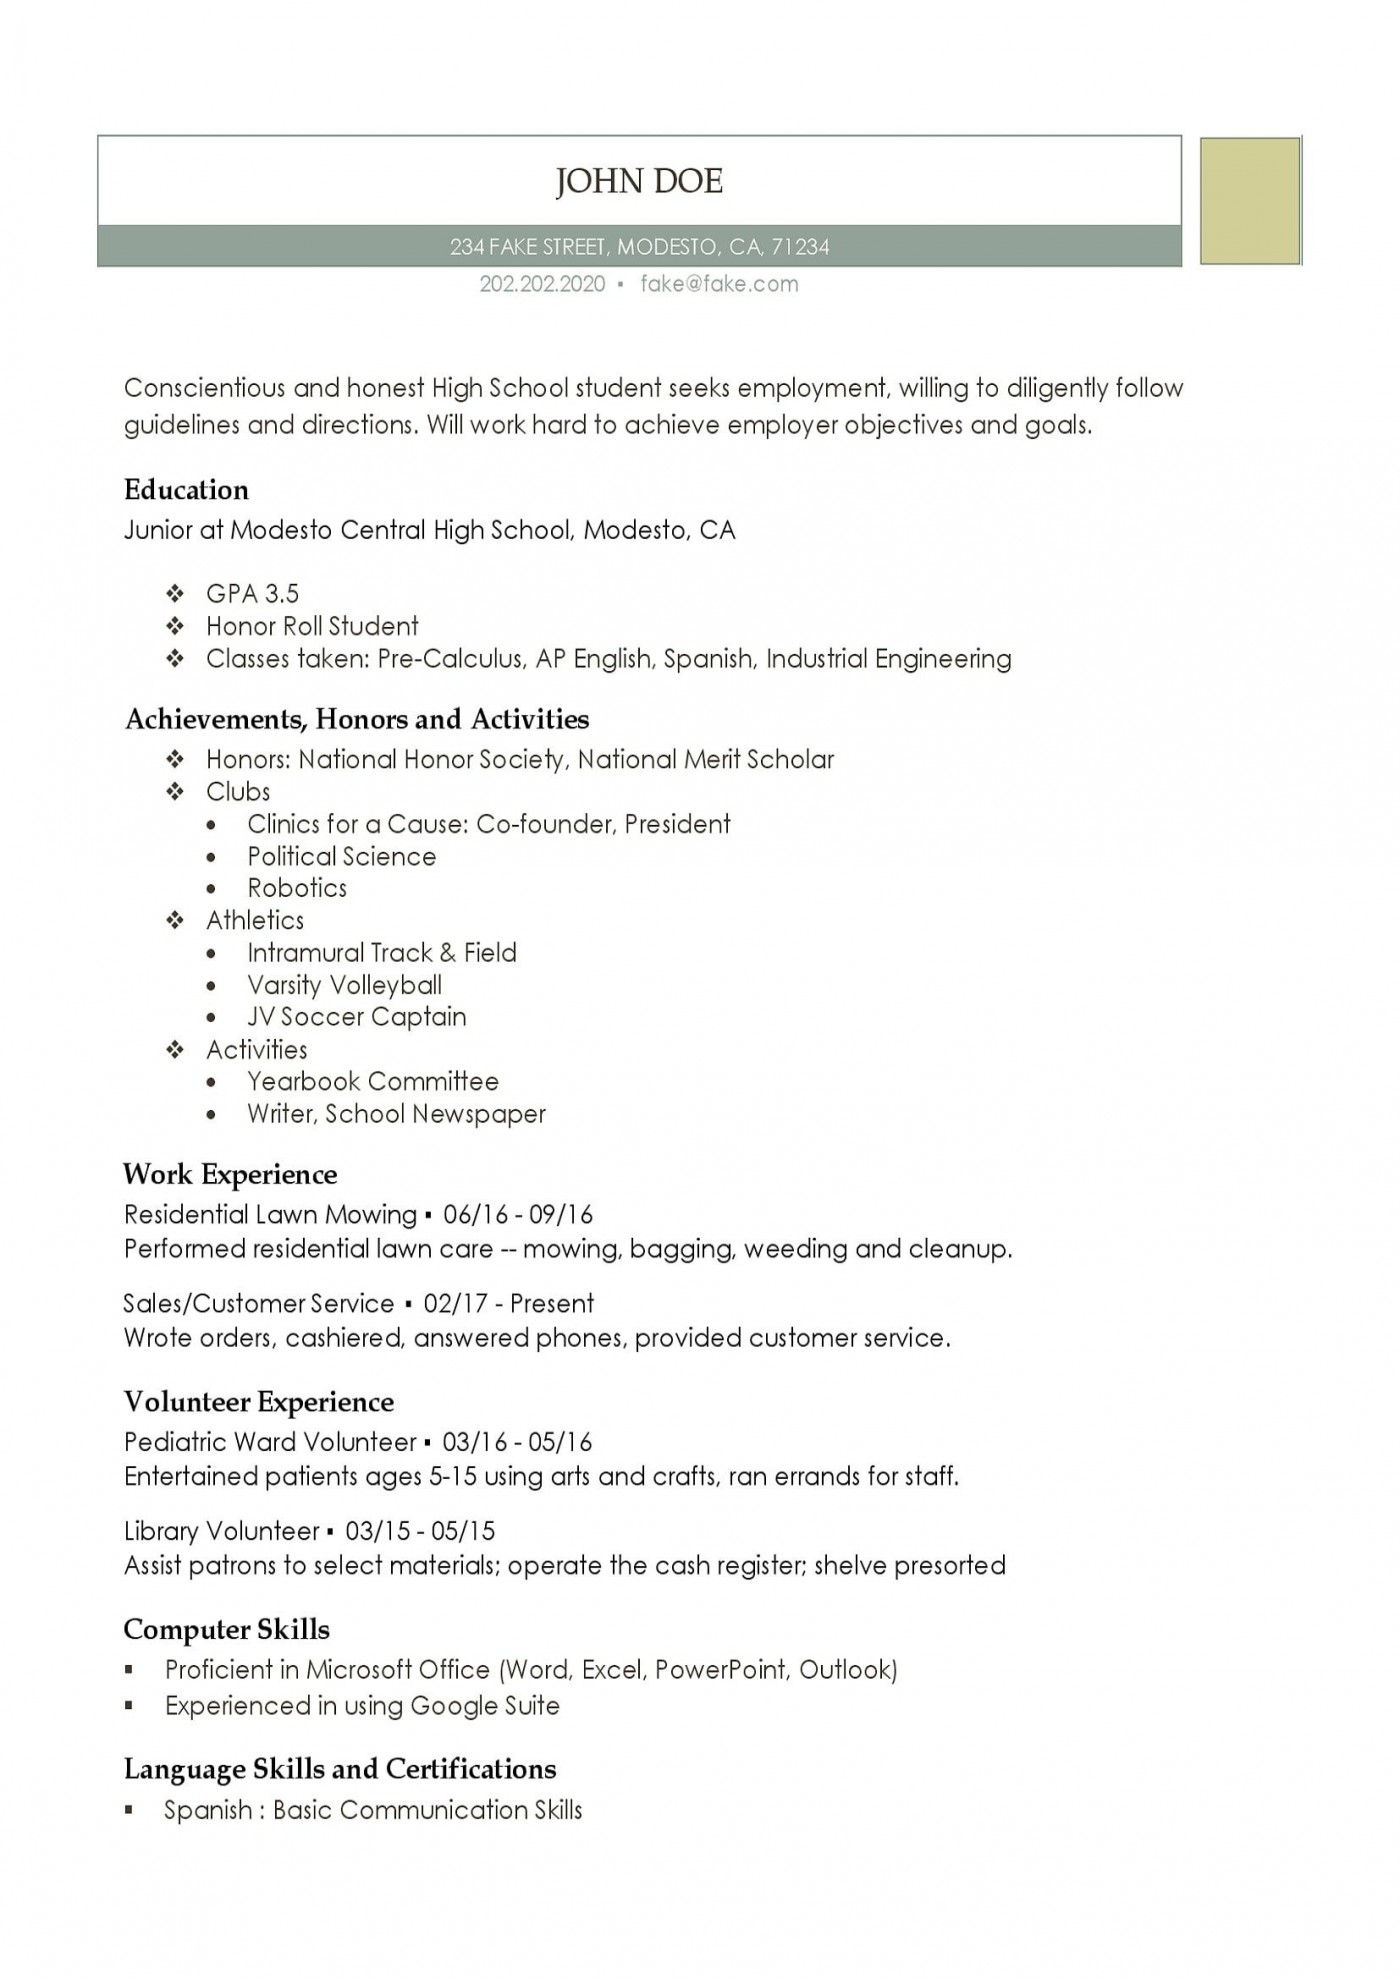 003 Unforgettable Free High School Resume Template Microsoft Word Inspiration 1400